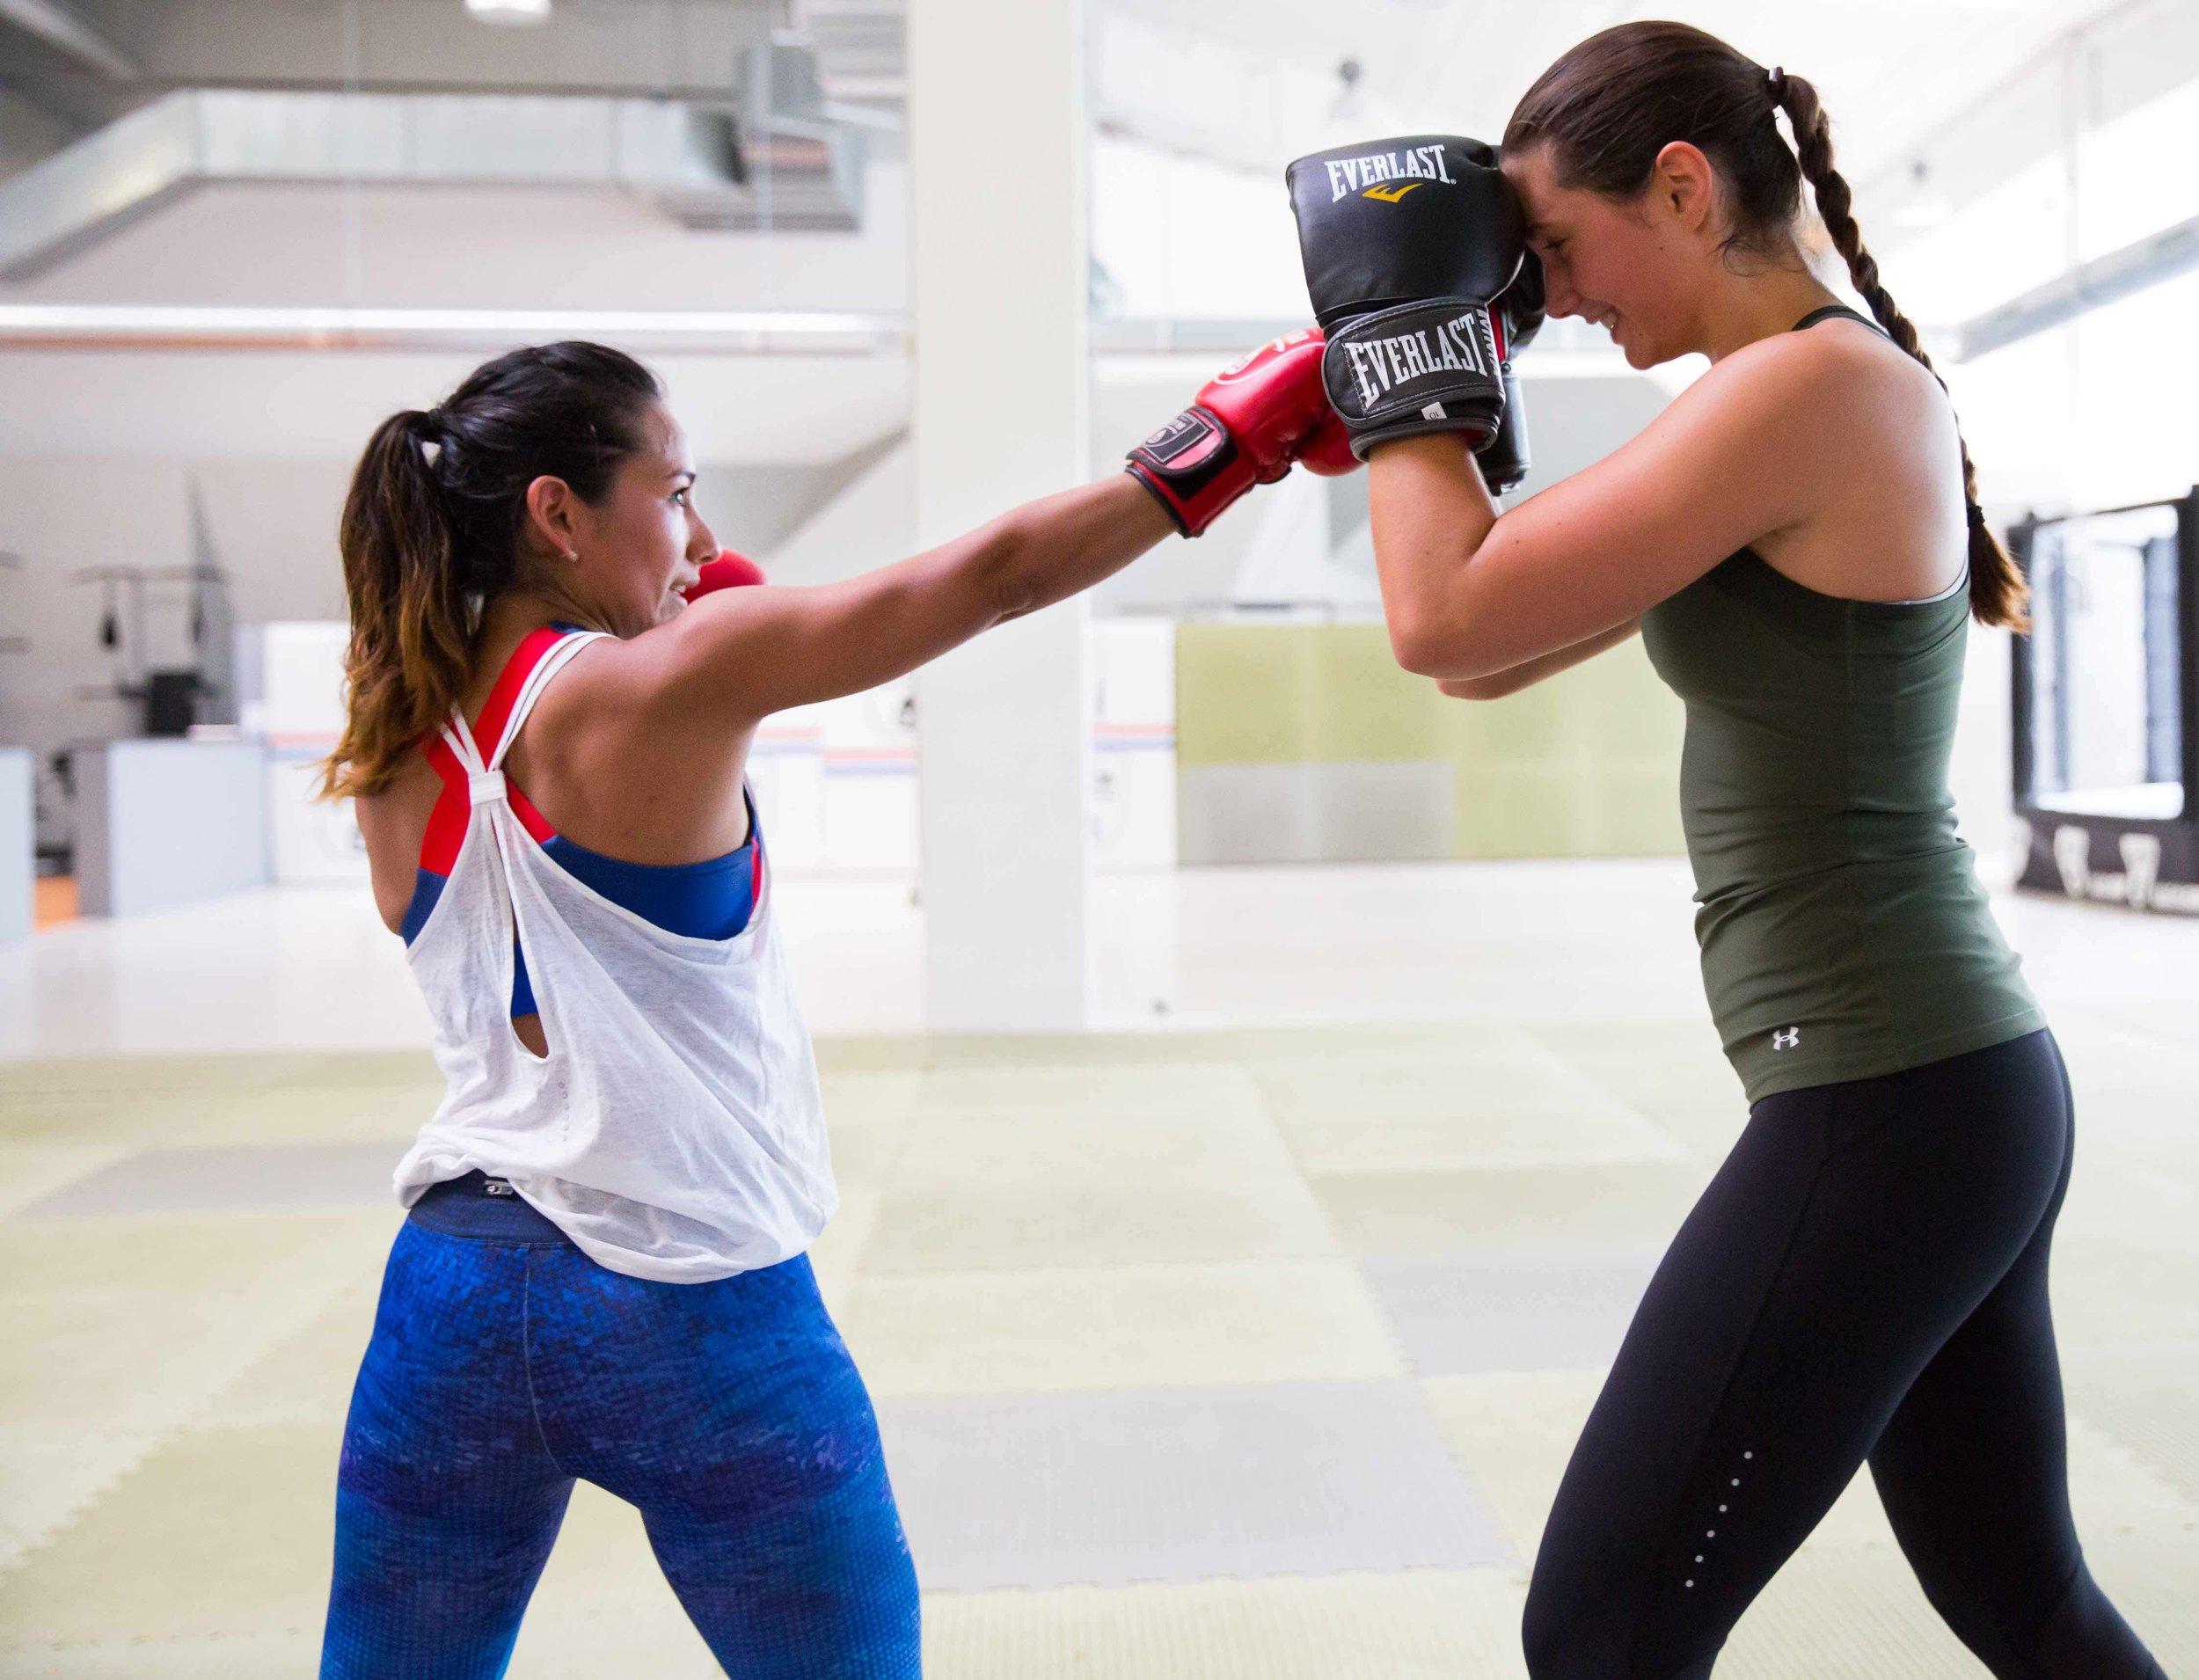 Kickboxing-gym-23-fitness-blog-wien-7-1.jpg